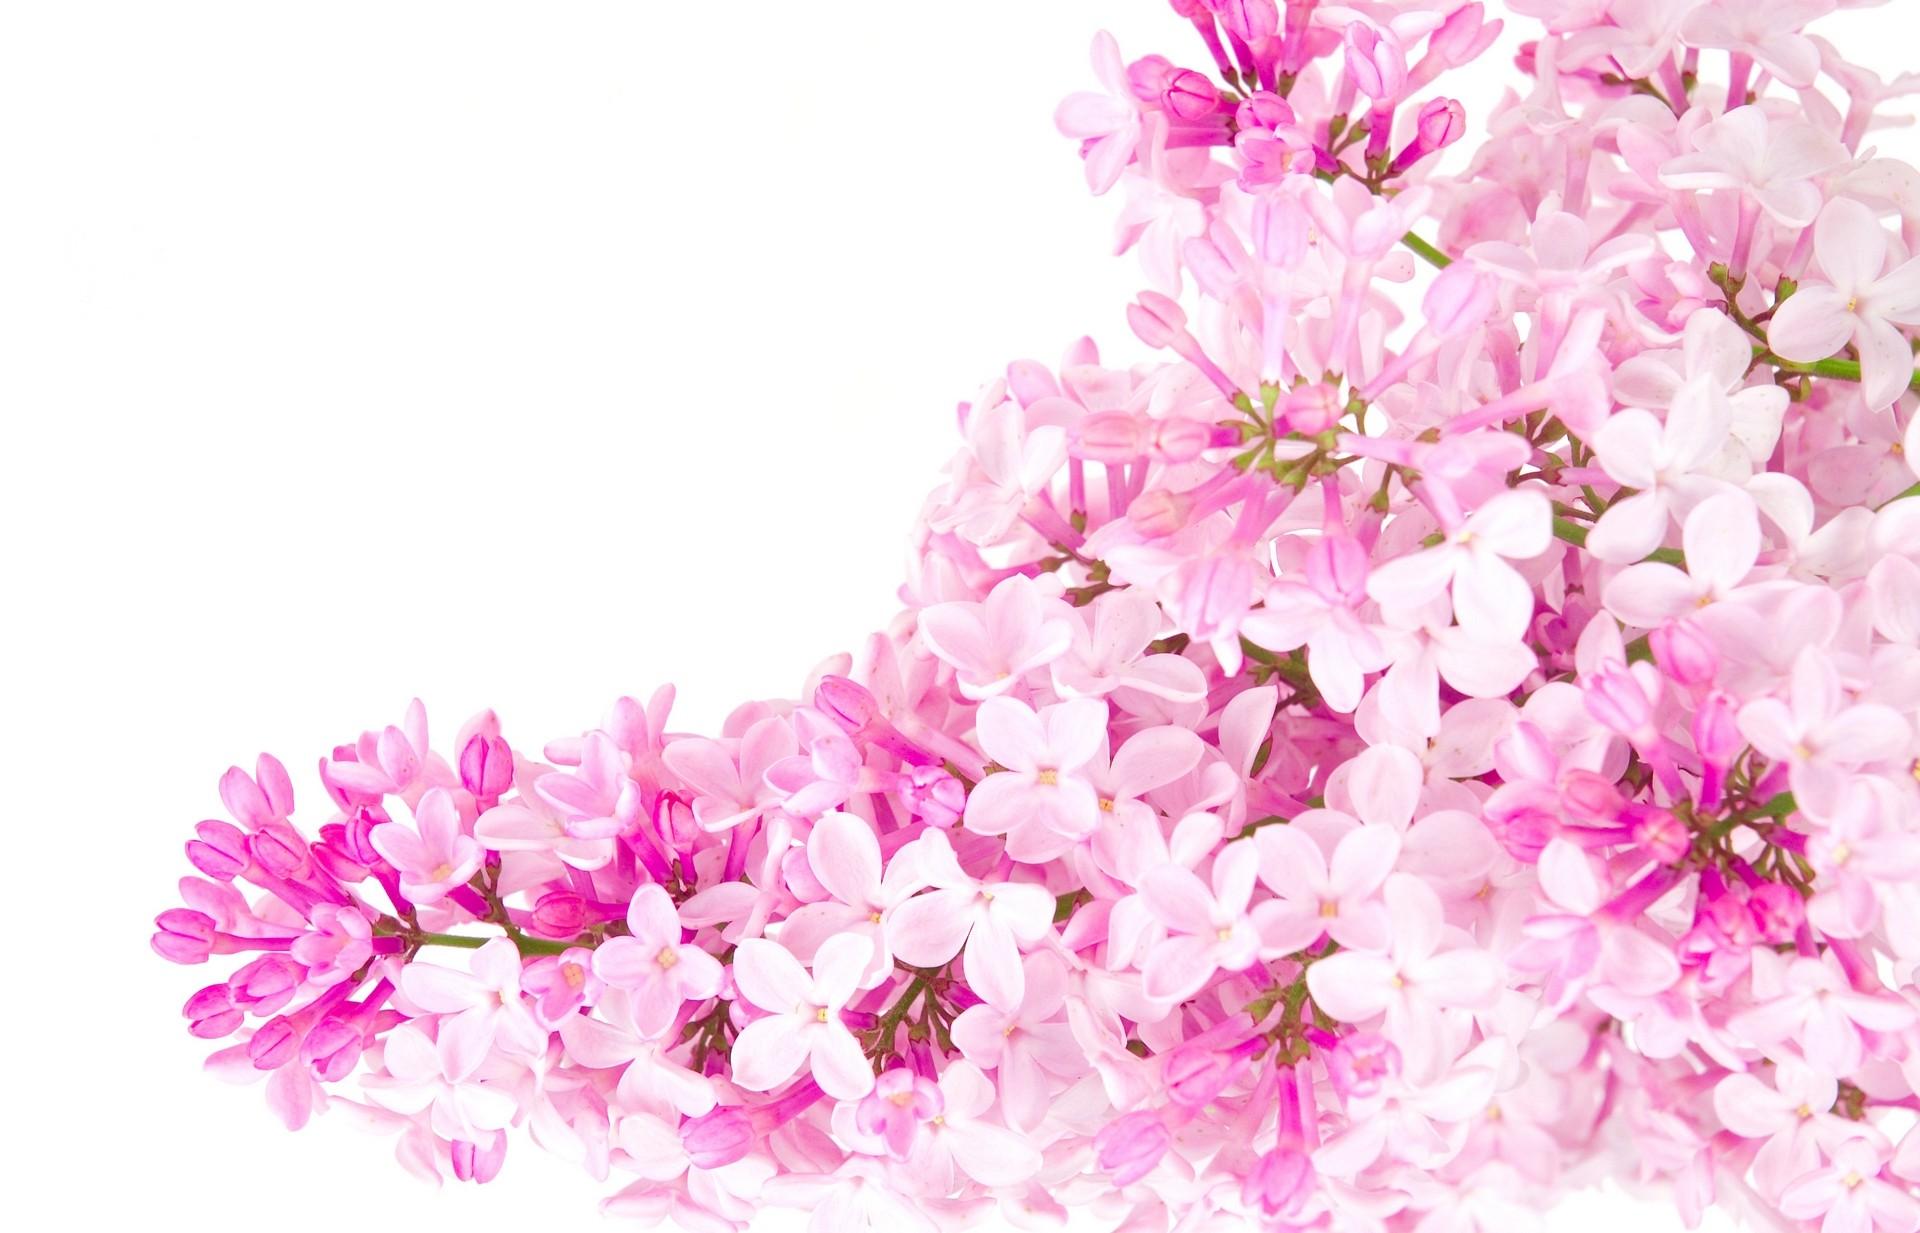 Best aesthetic edgy cute tumblr quotes. Flower Backgrounds Tumblr | PixelsTalk.Net